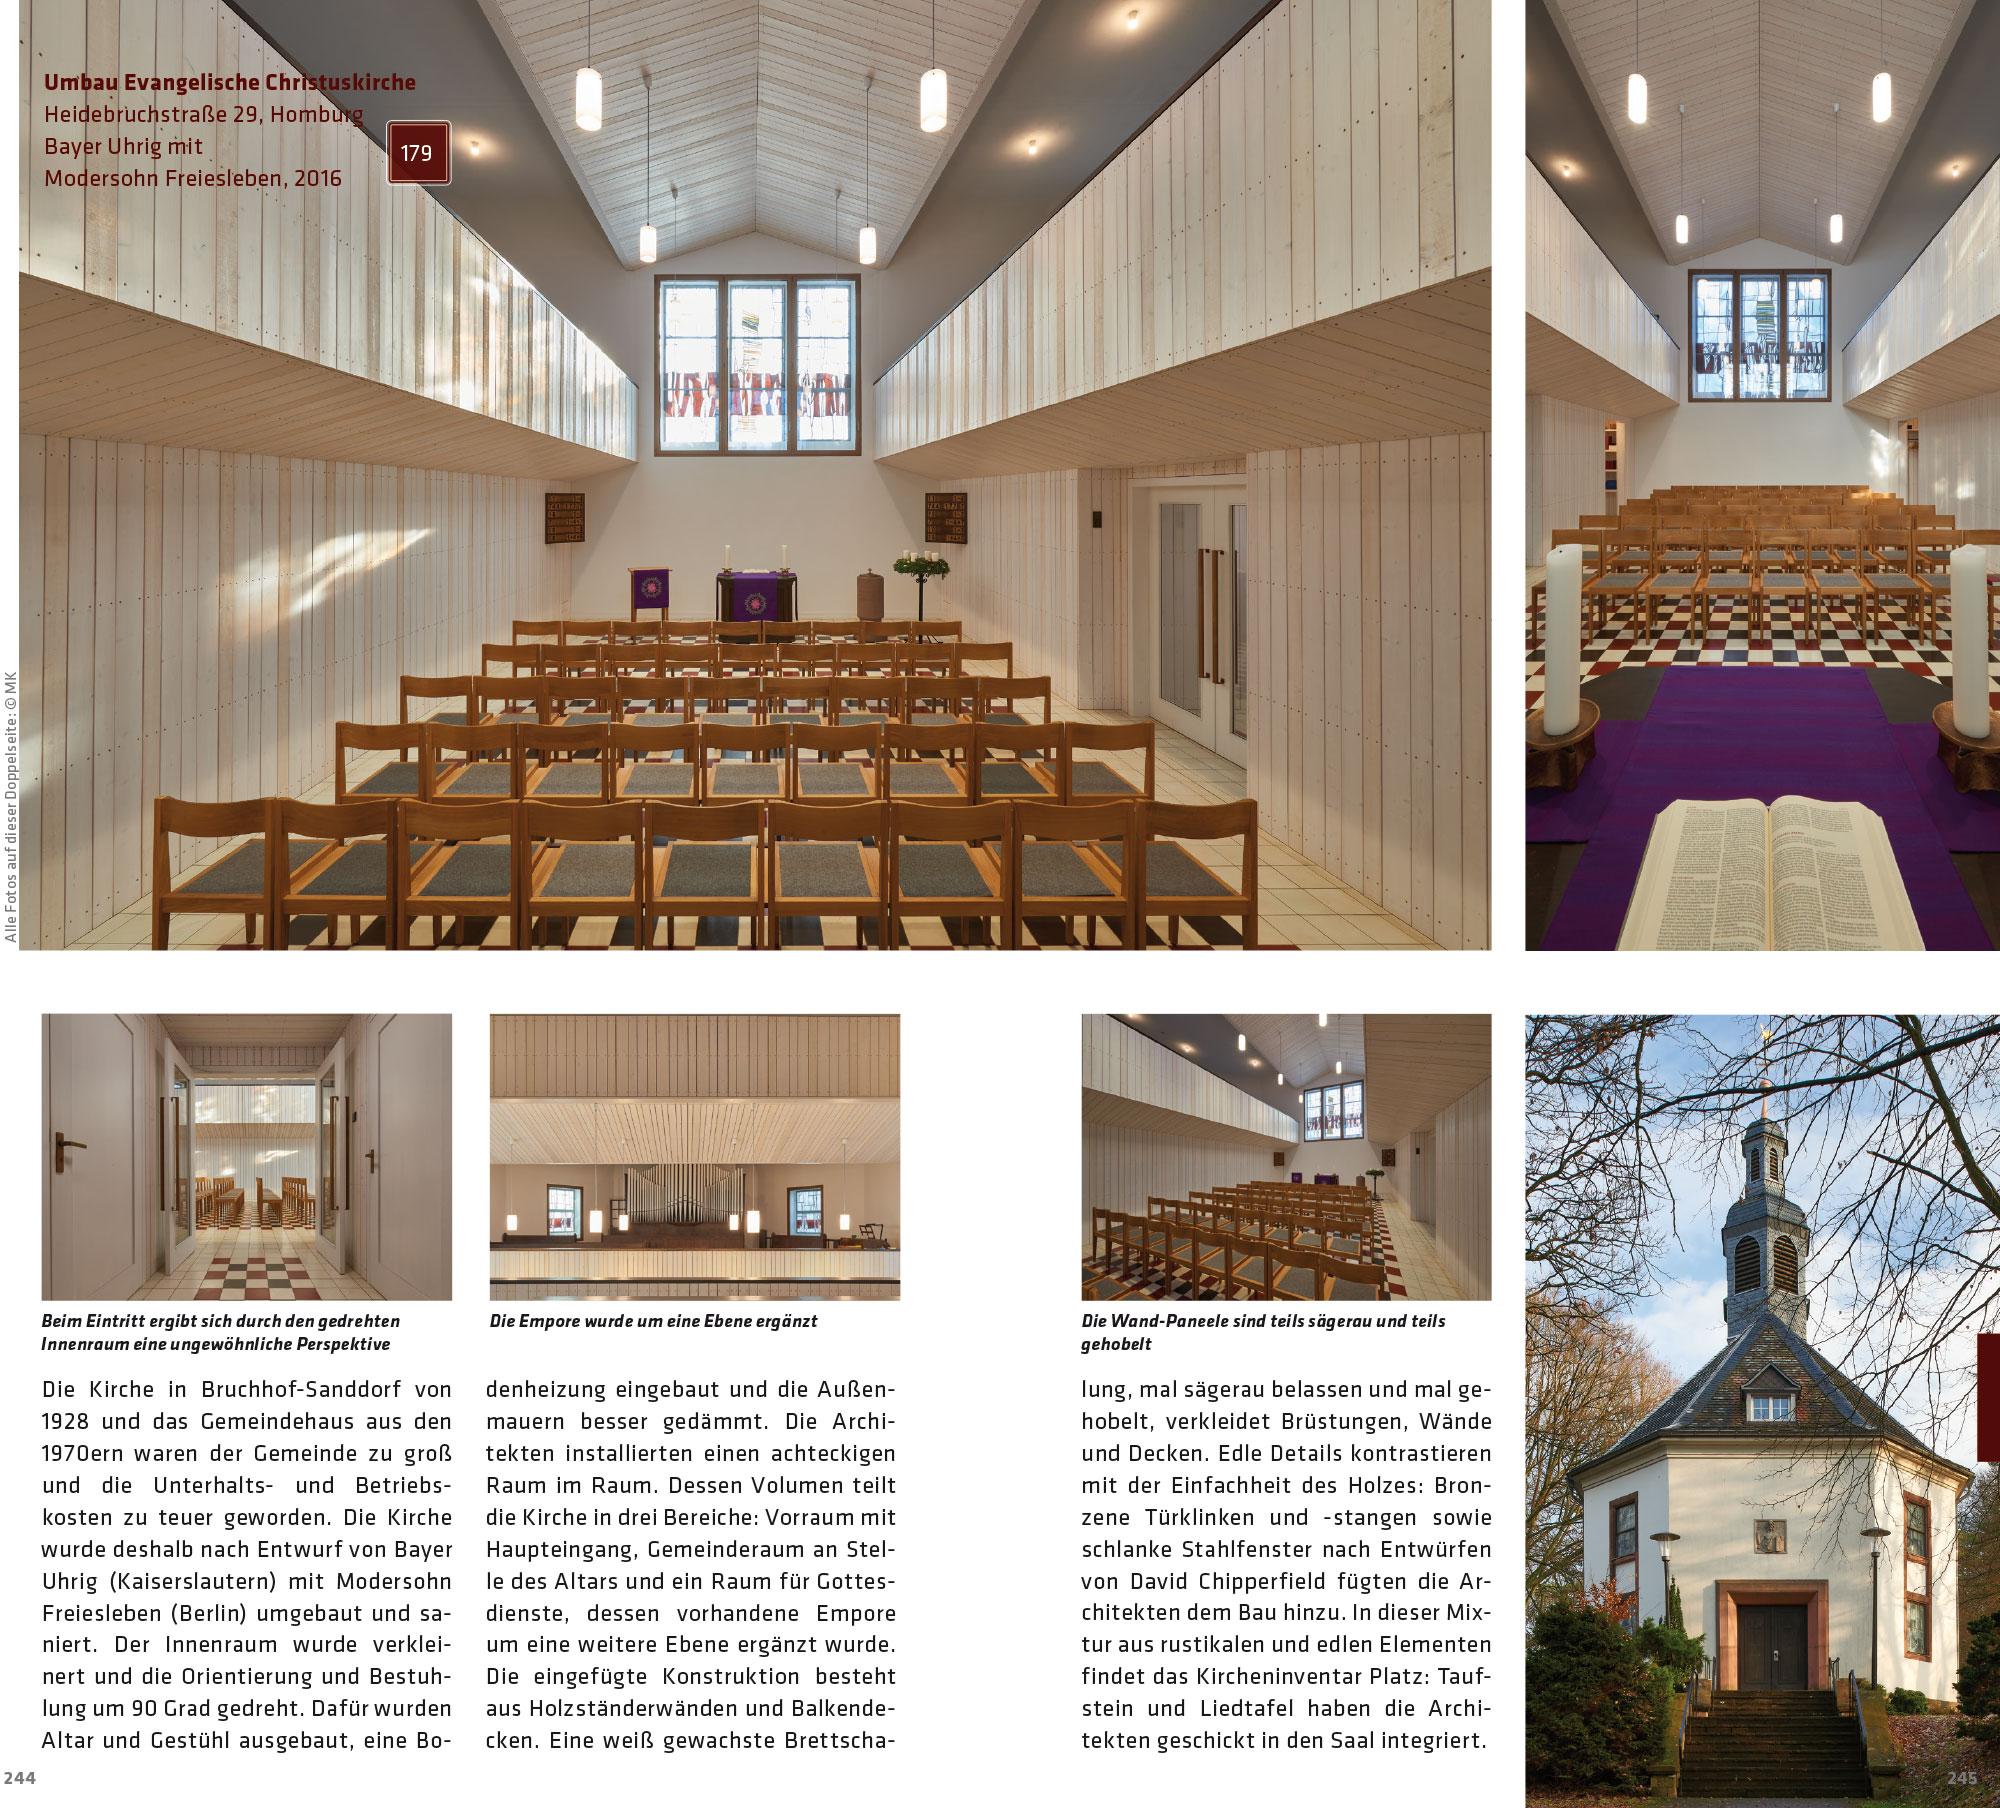 Buch-Doppelseite: Christuskirche in Homburg-Bruchhof